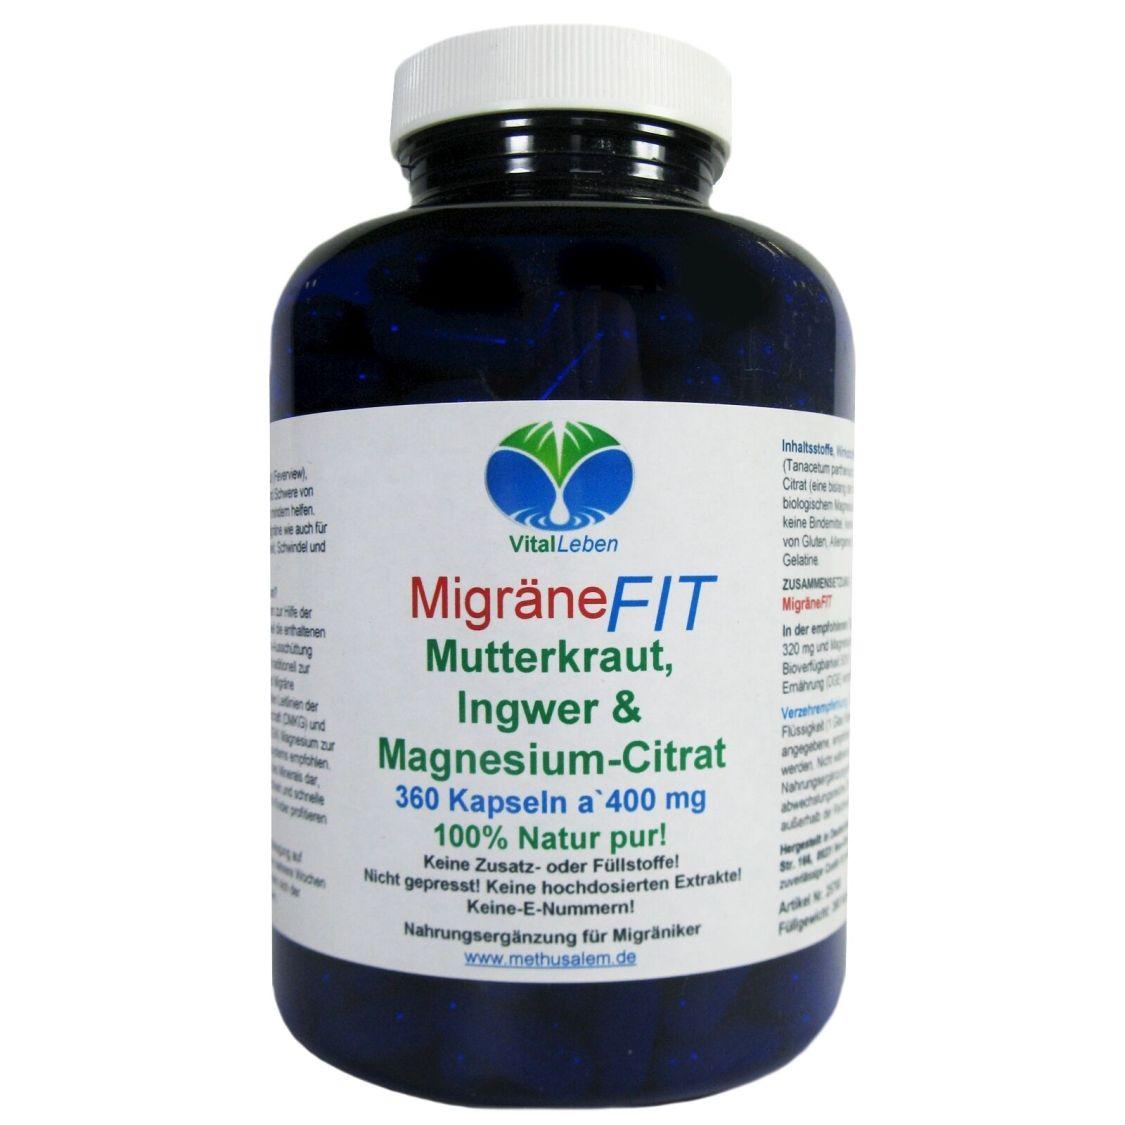 MigräneFIT Mutterkraut Ingwer & Magnesium-Citrat 360 Kapseln Natur Pur #25768